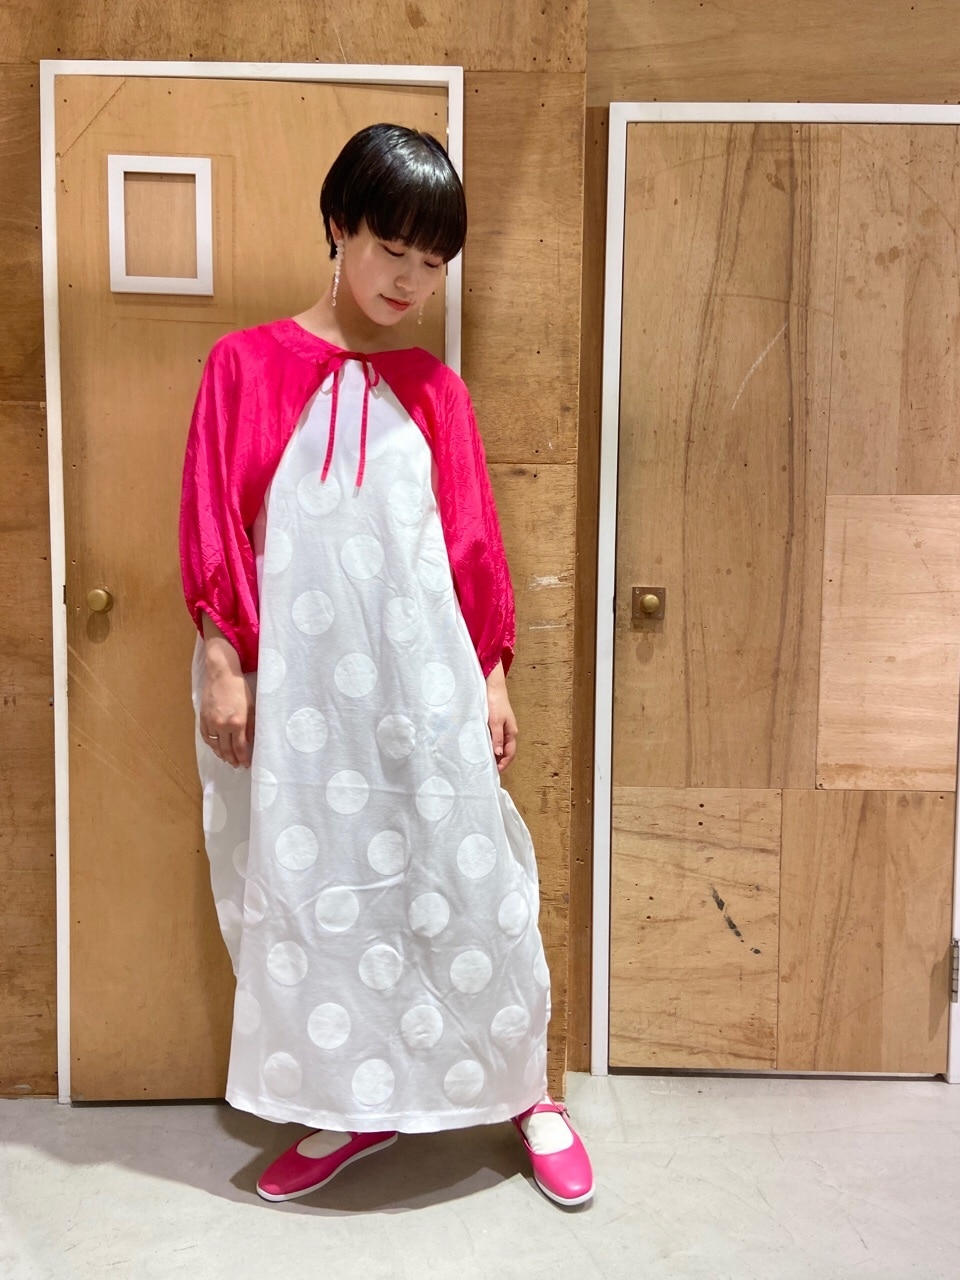 l'atelier du savon 新宿ミロード 身長:159cm 2020.08.27